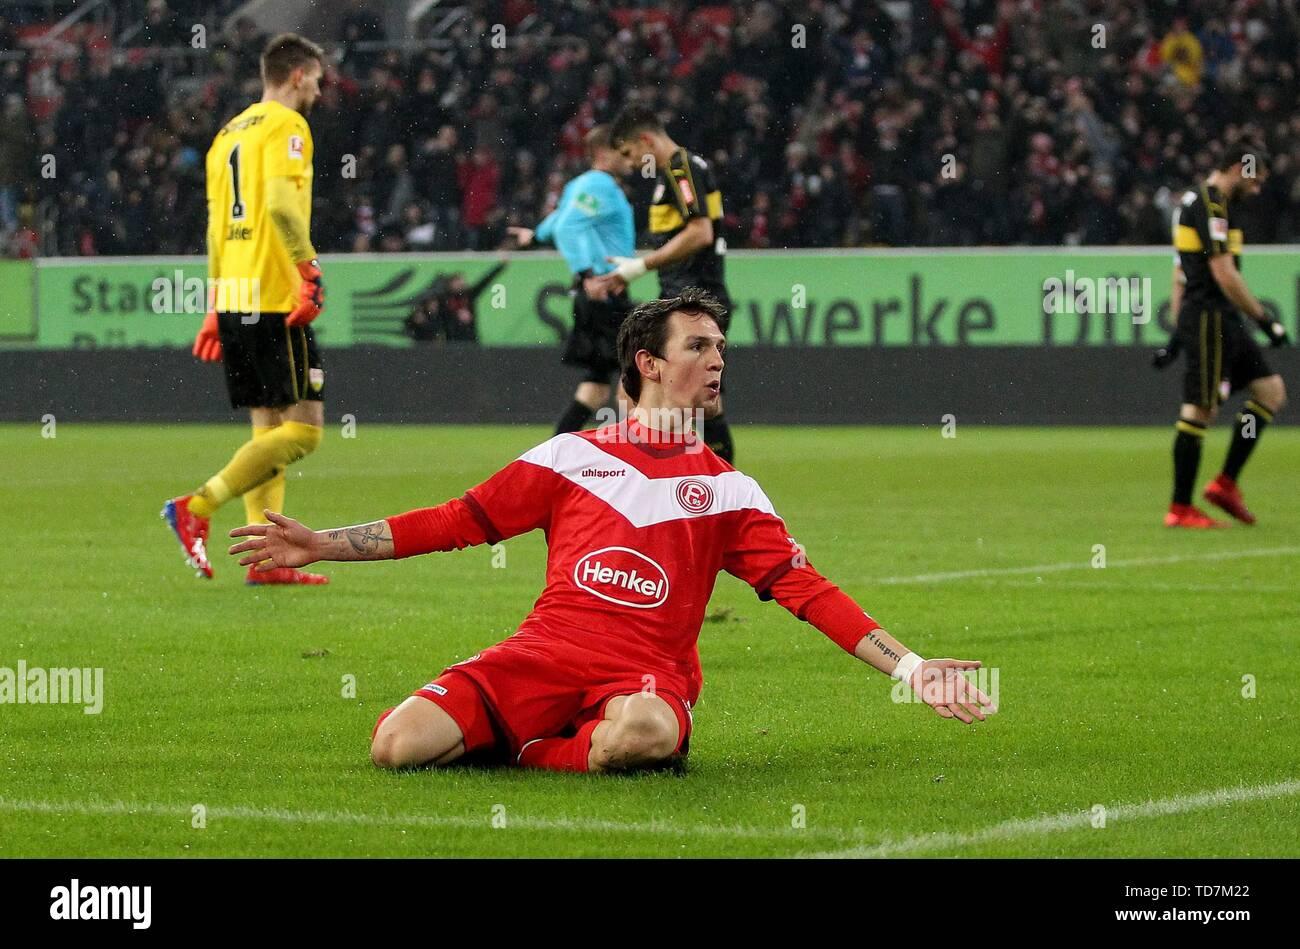 firo: 10.02.2019, Fuvuball, 1.Bundesliga, season 2018/2019, Fortuna Dv? seldorf - VfB Stuttgart, goal to 3: 0, Benito RAMAN, Fortuna Dv? seldorf, goaljubel, jubilation, joy, | usage worldwide - Stock Image